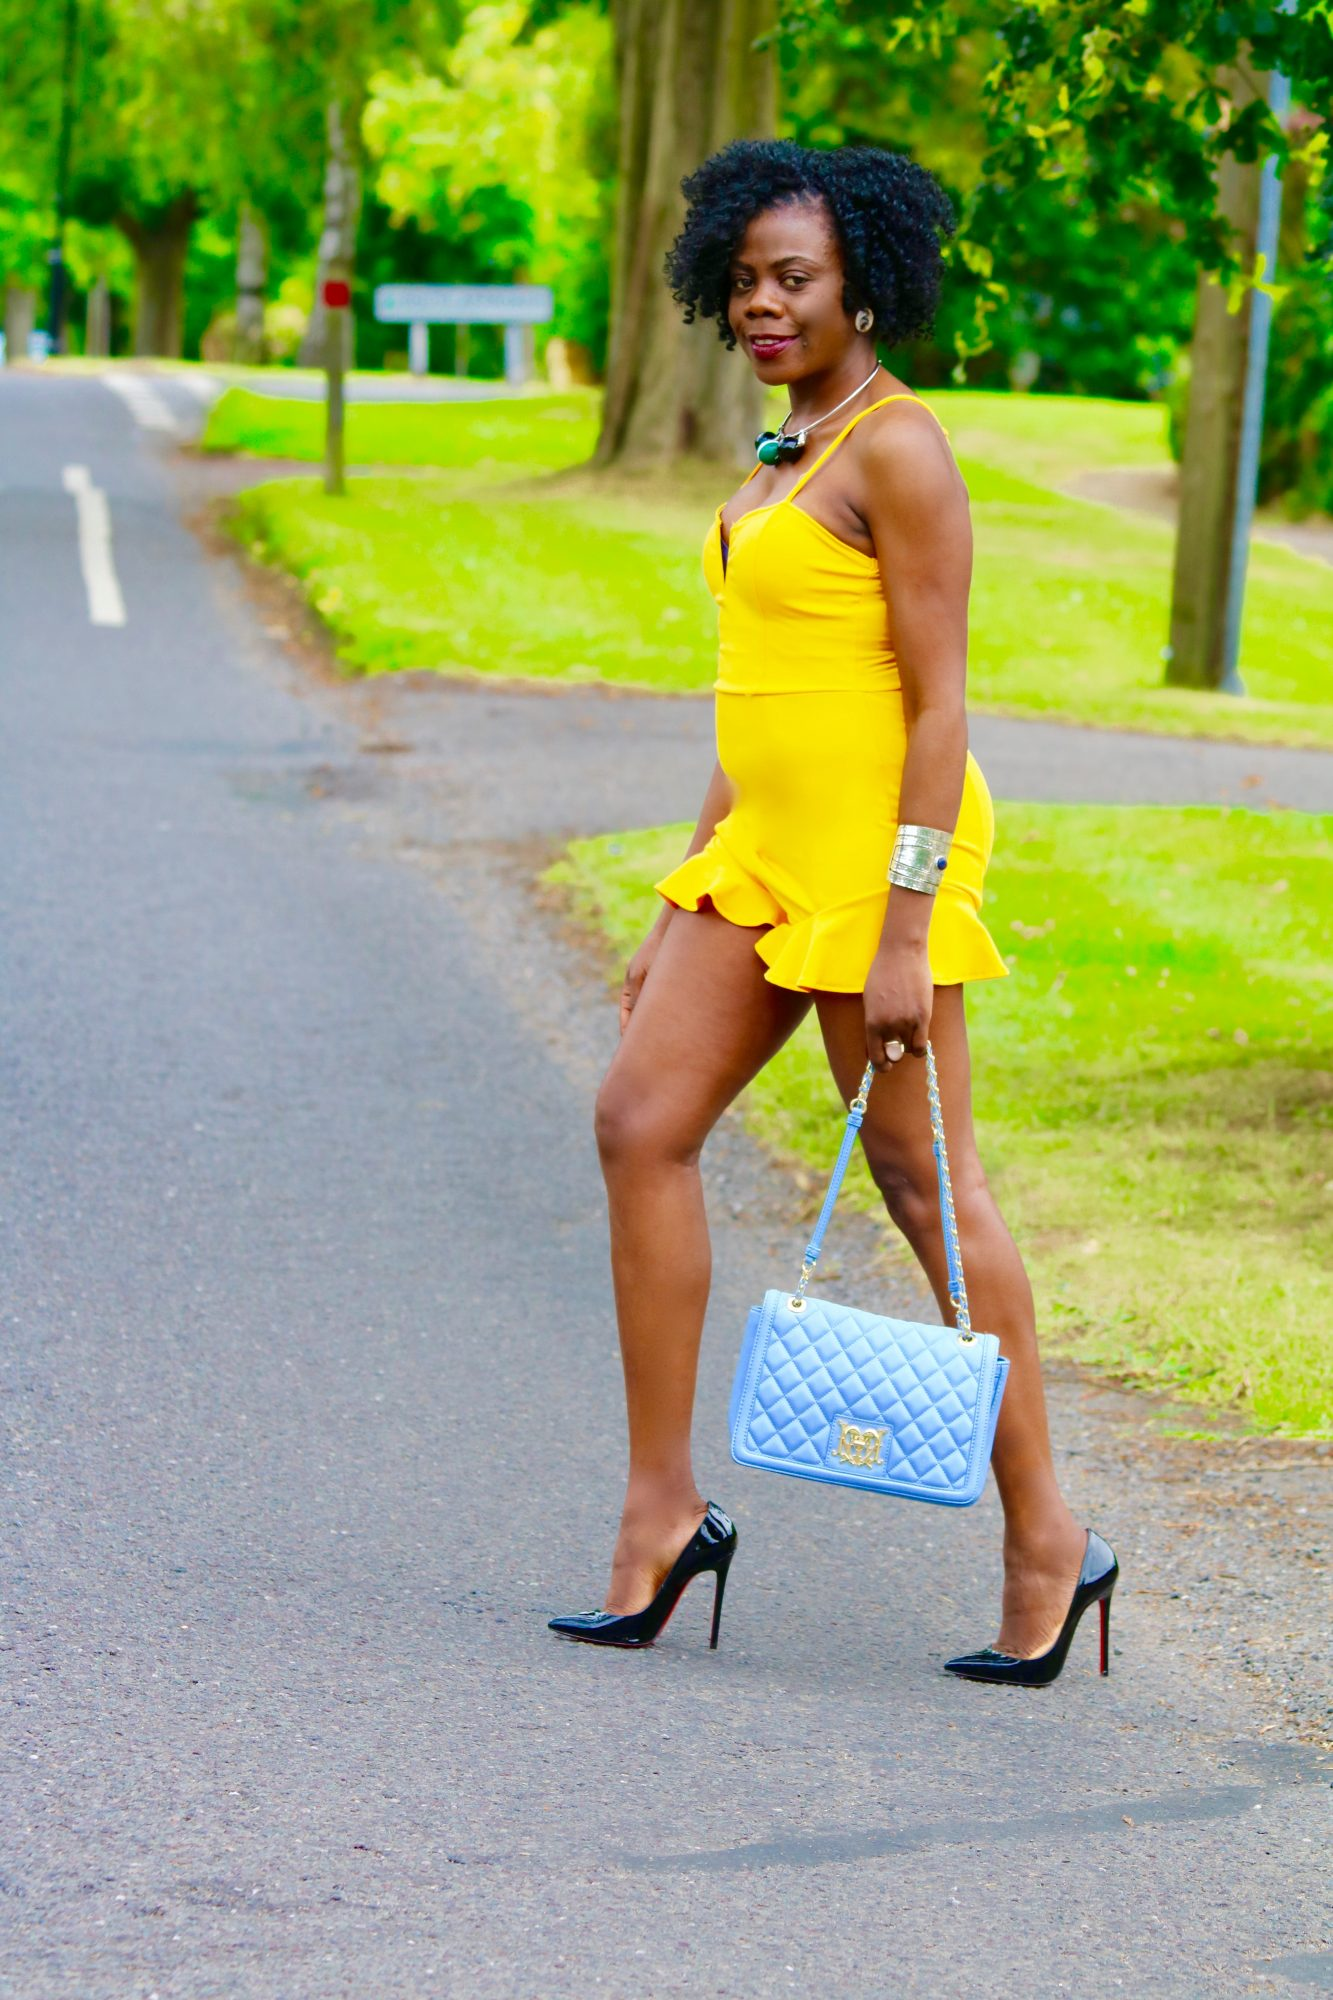 Street-Style by Mammypi